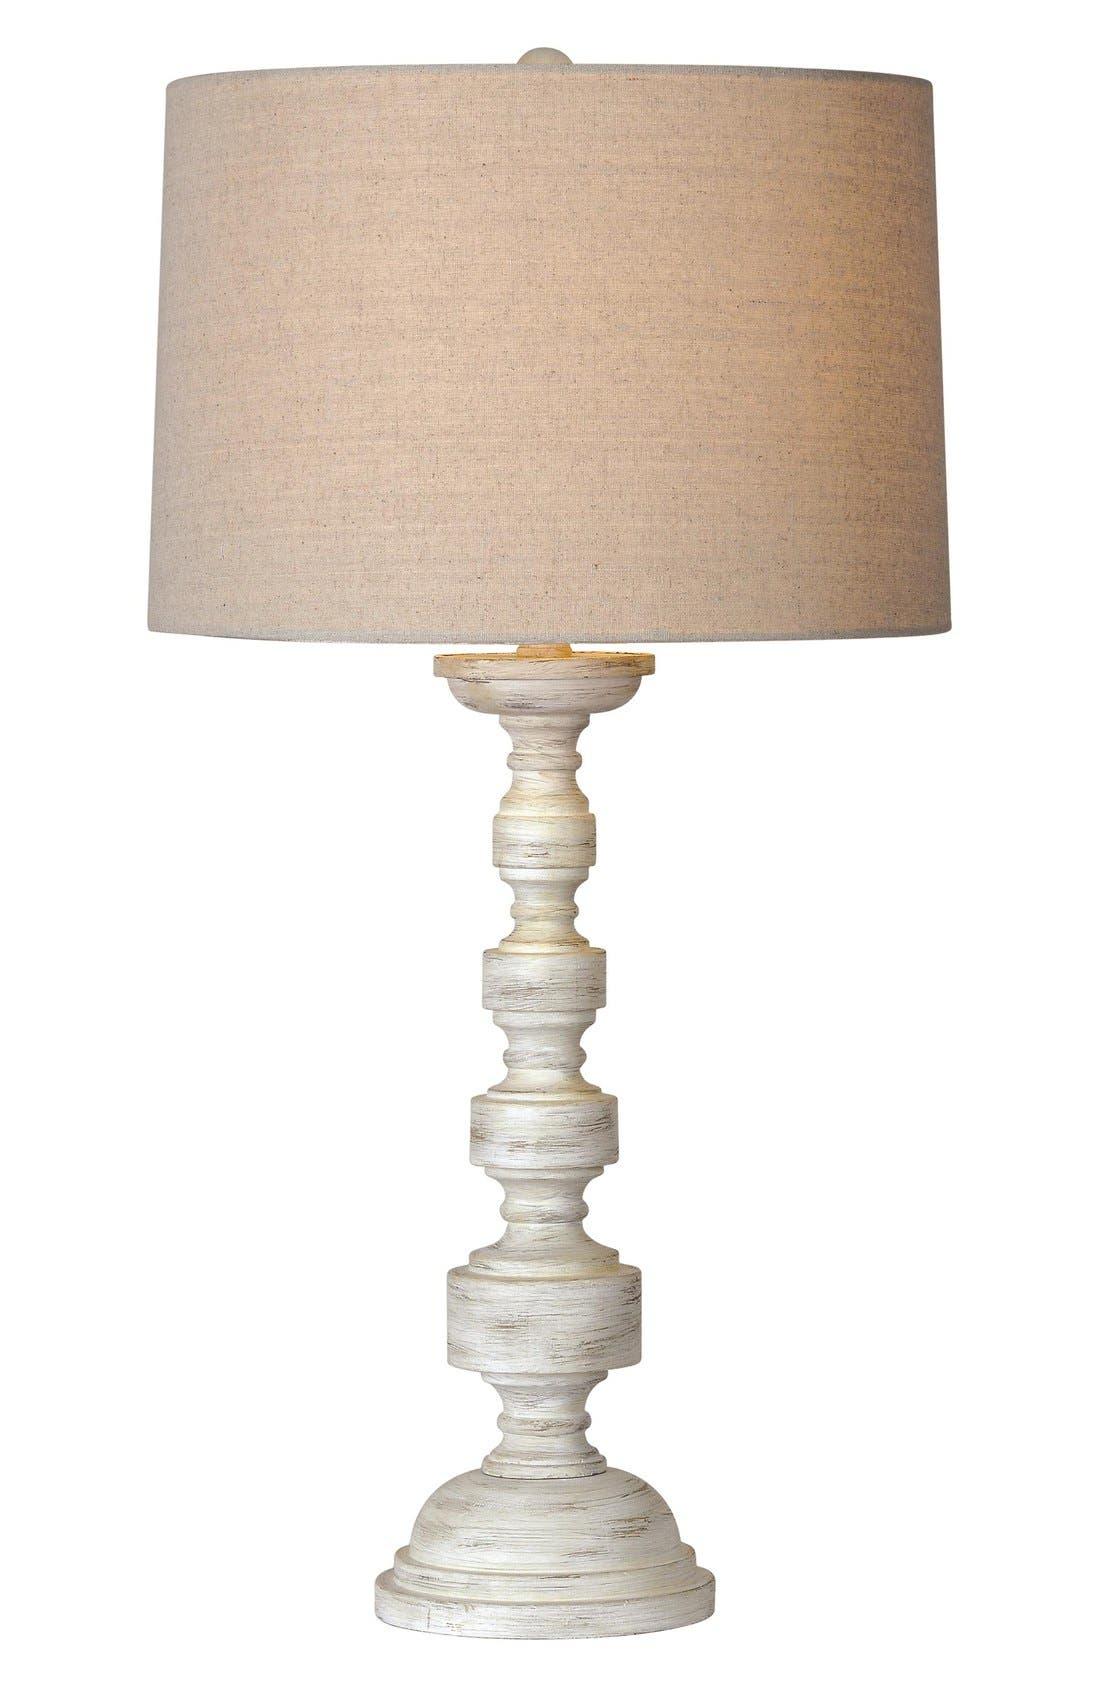 Alternate Image 1 Selected - Renwil'Chelsea' Table Lamp